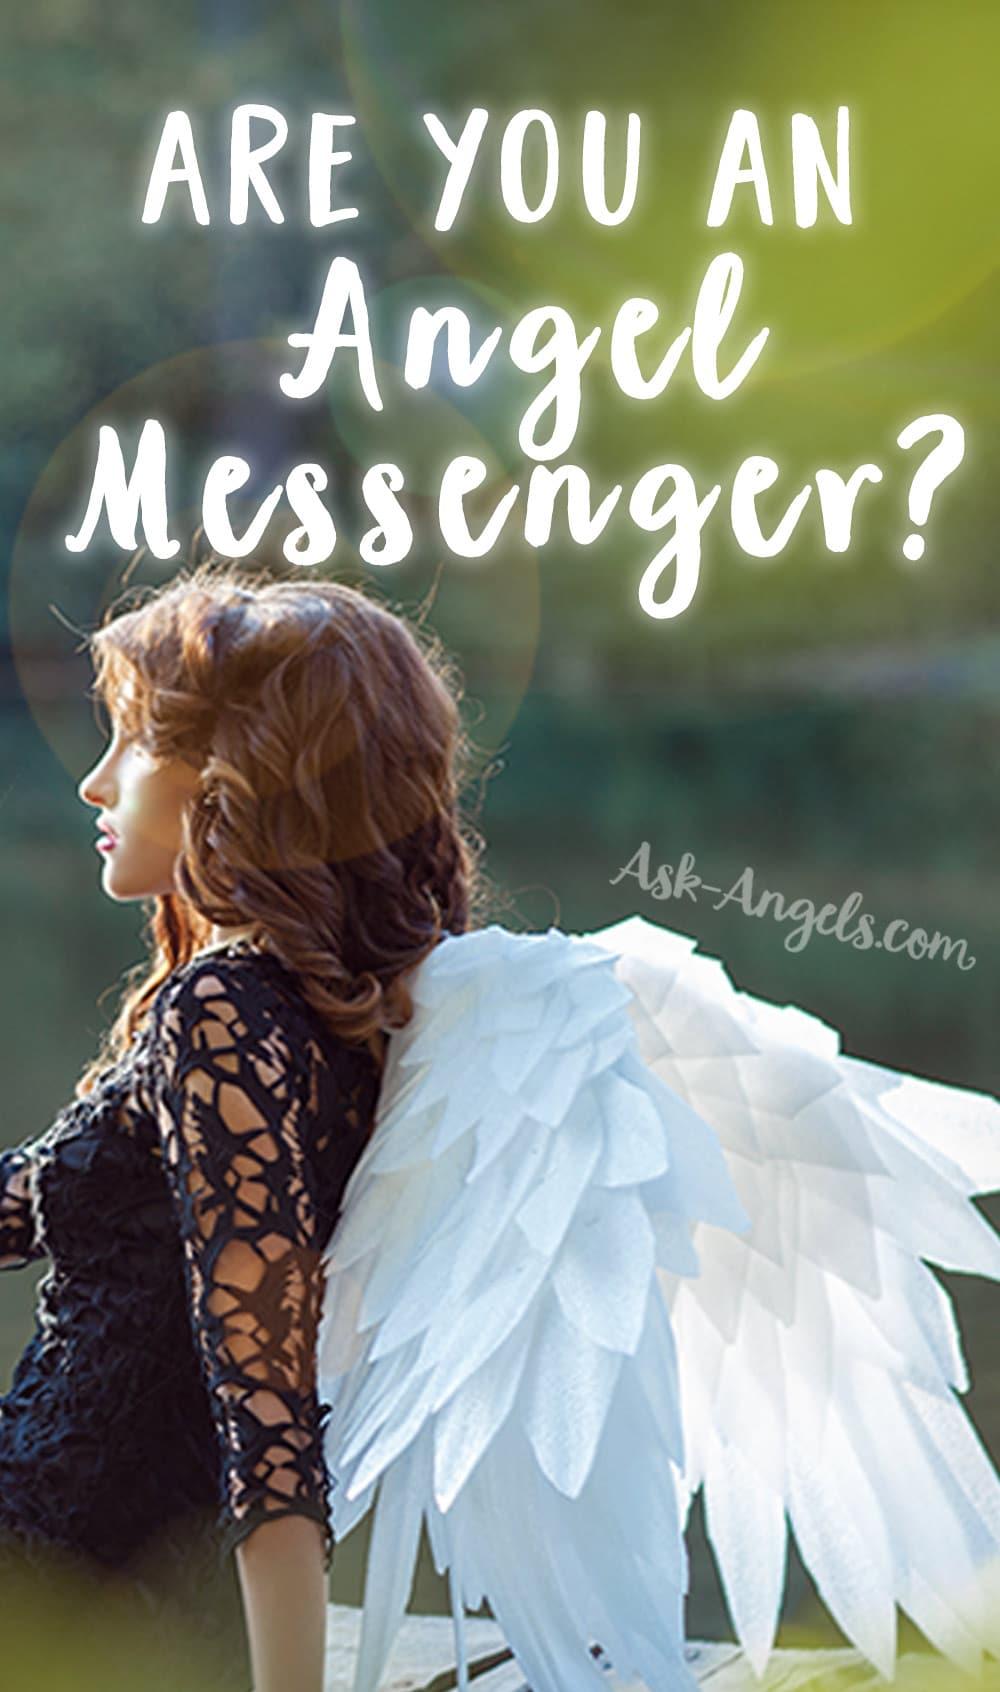 humanuniver tips of life angel messenger 1